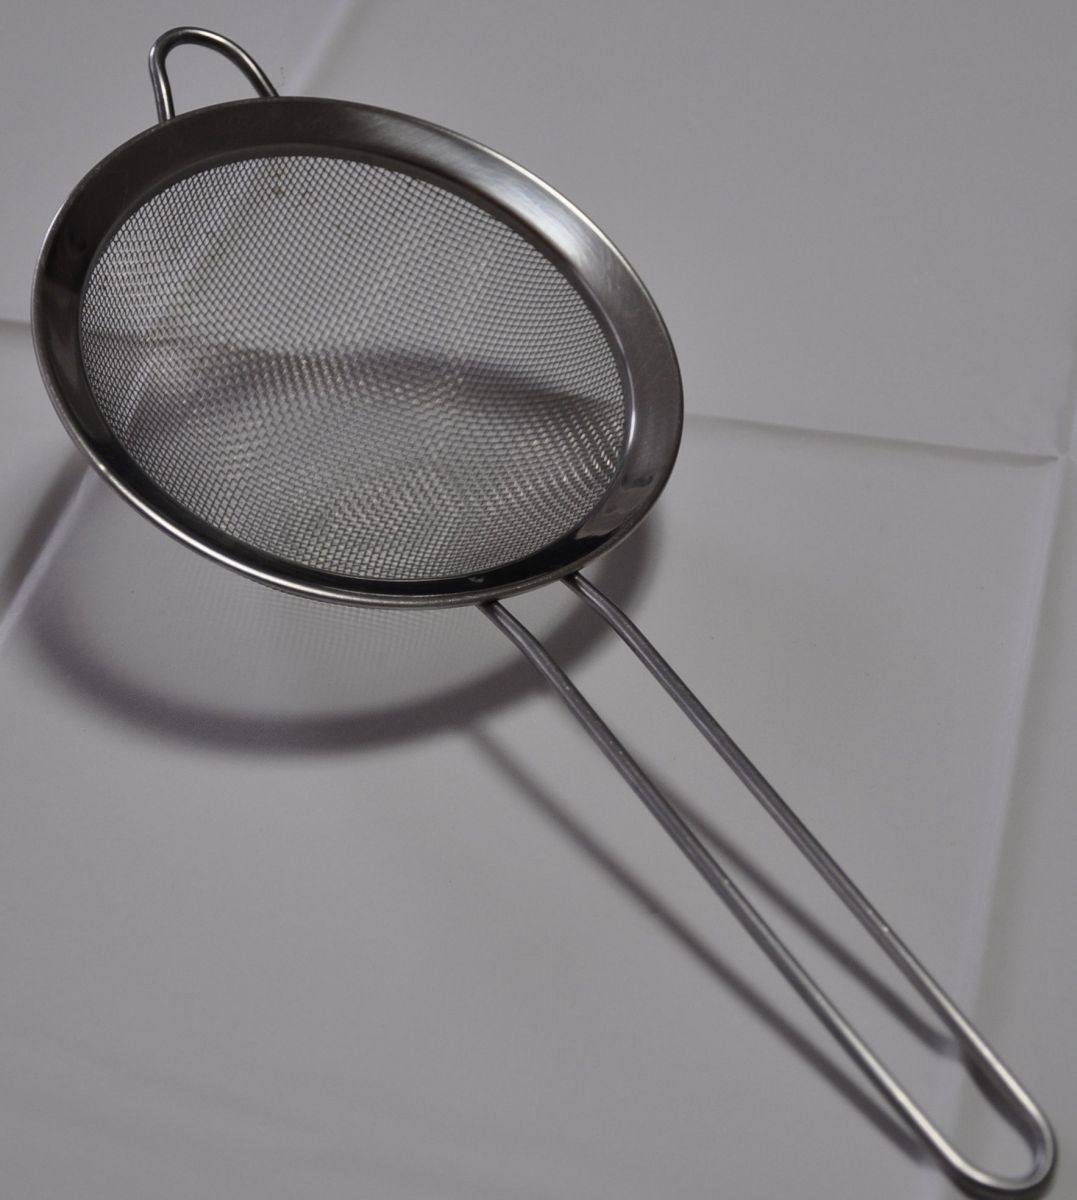 Cómo desespumar un caldo correctamente